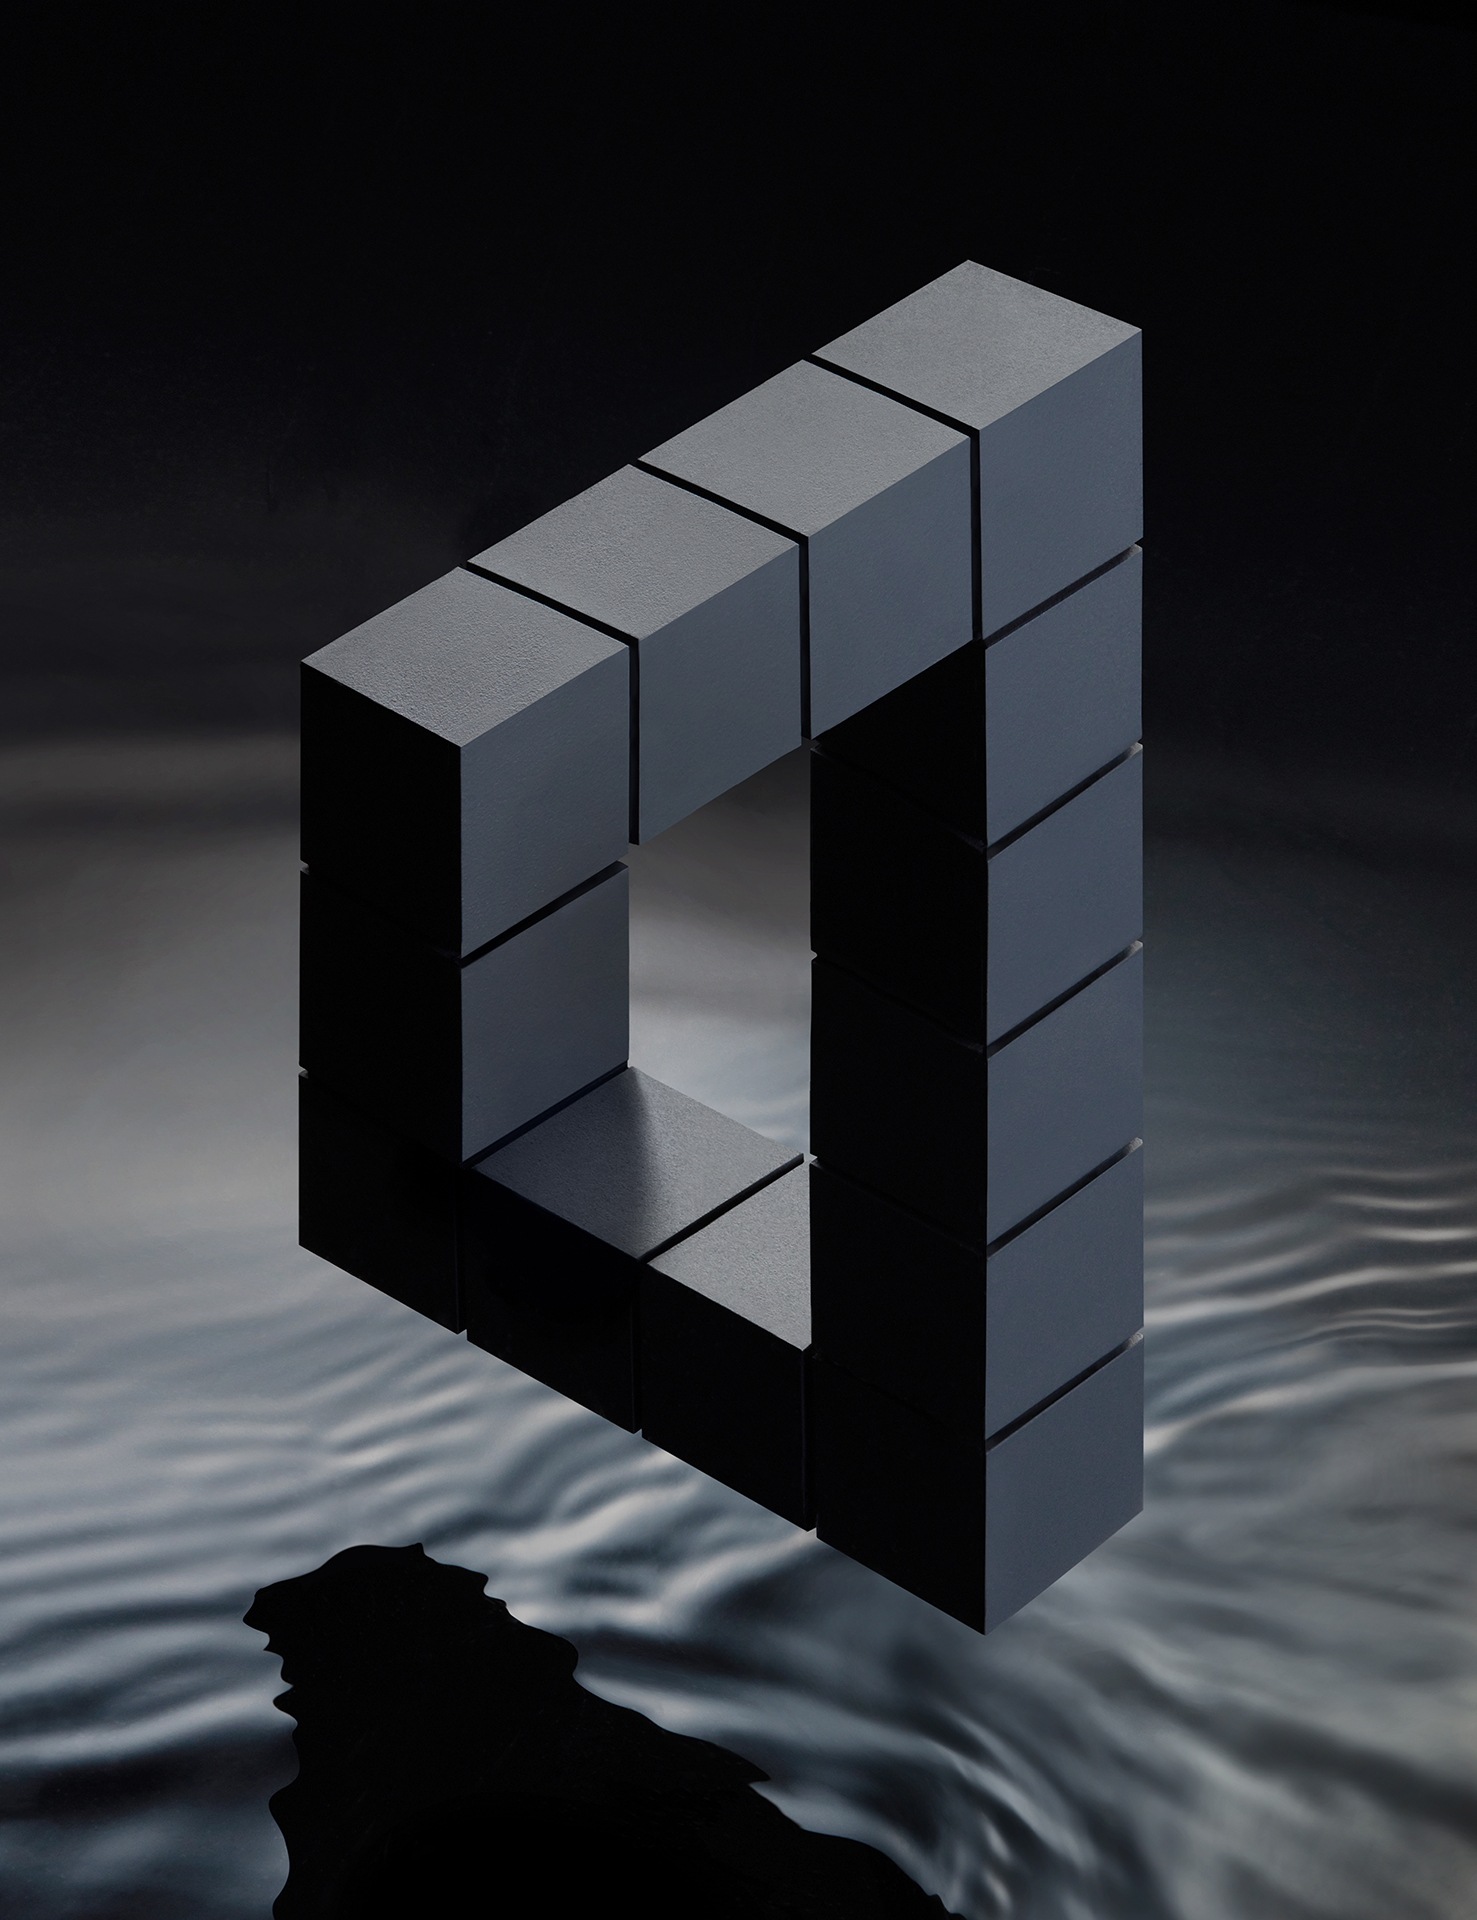 escher-impossible-shape-illusion-creative-still-life-photography-london-photographer-3